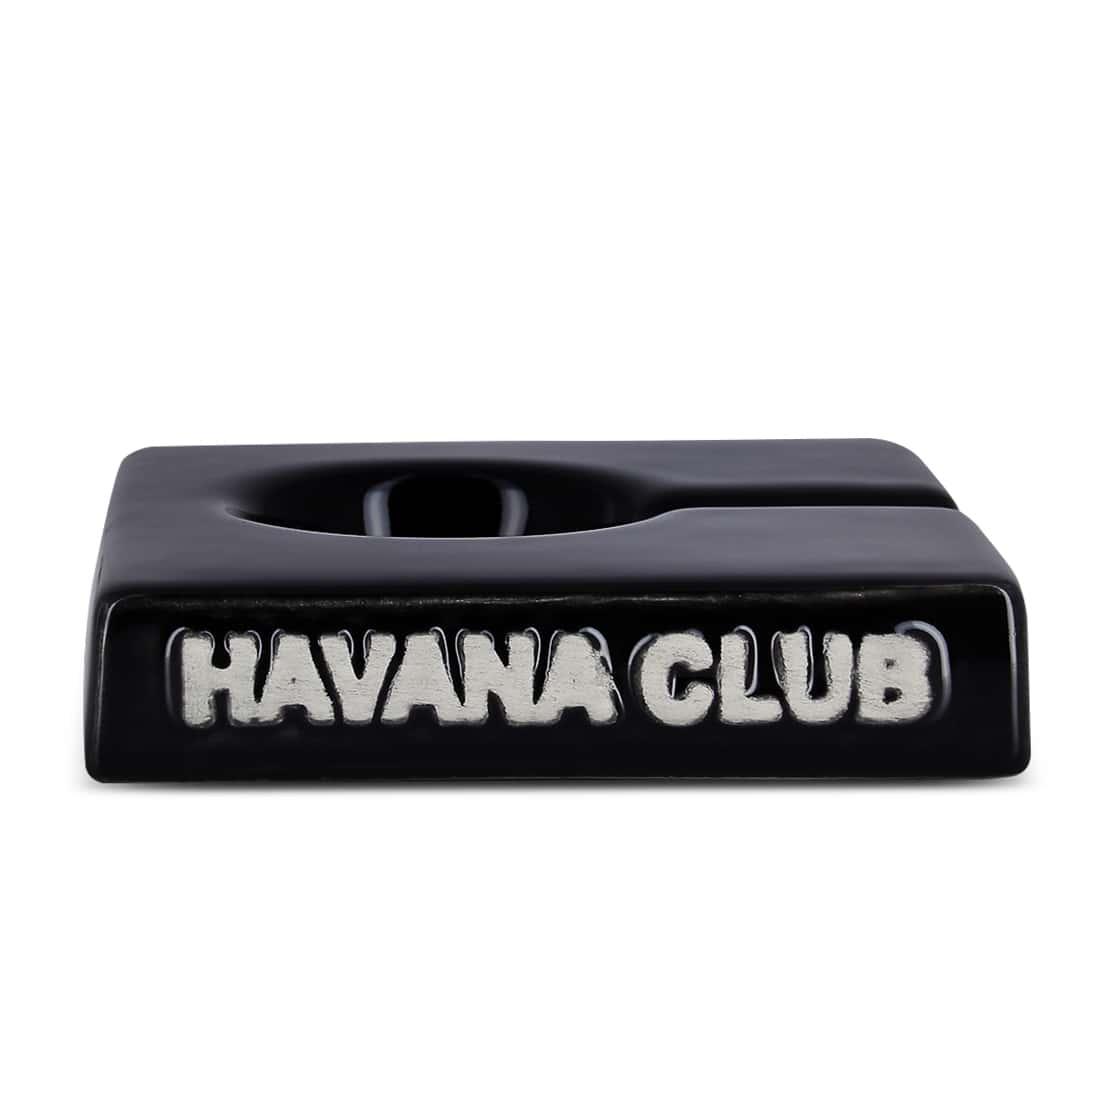 Photo de Cendrier Havana Club Solito Noir